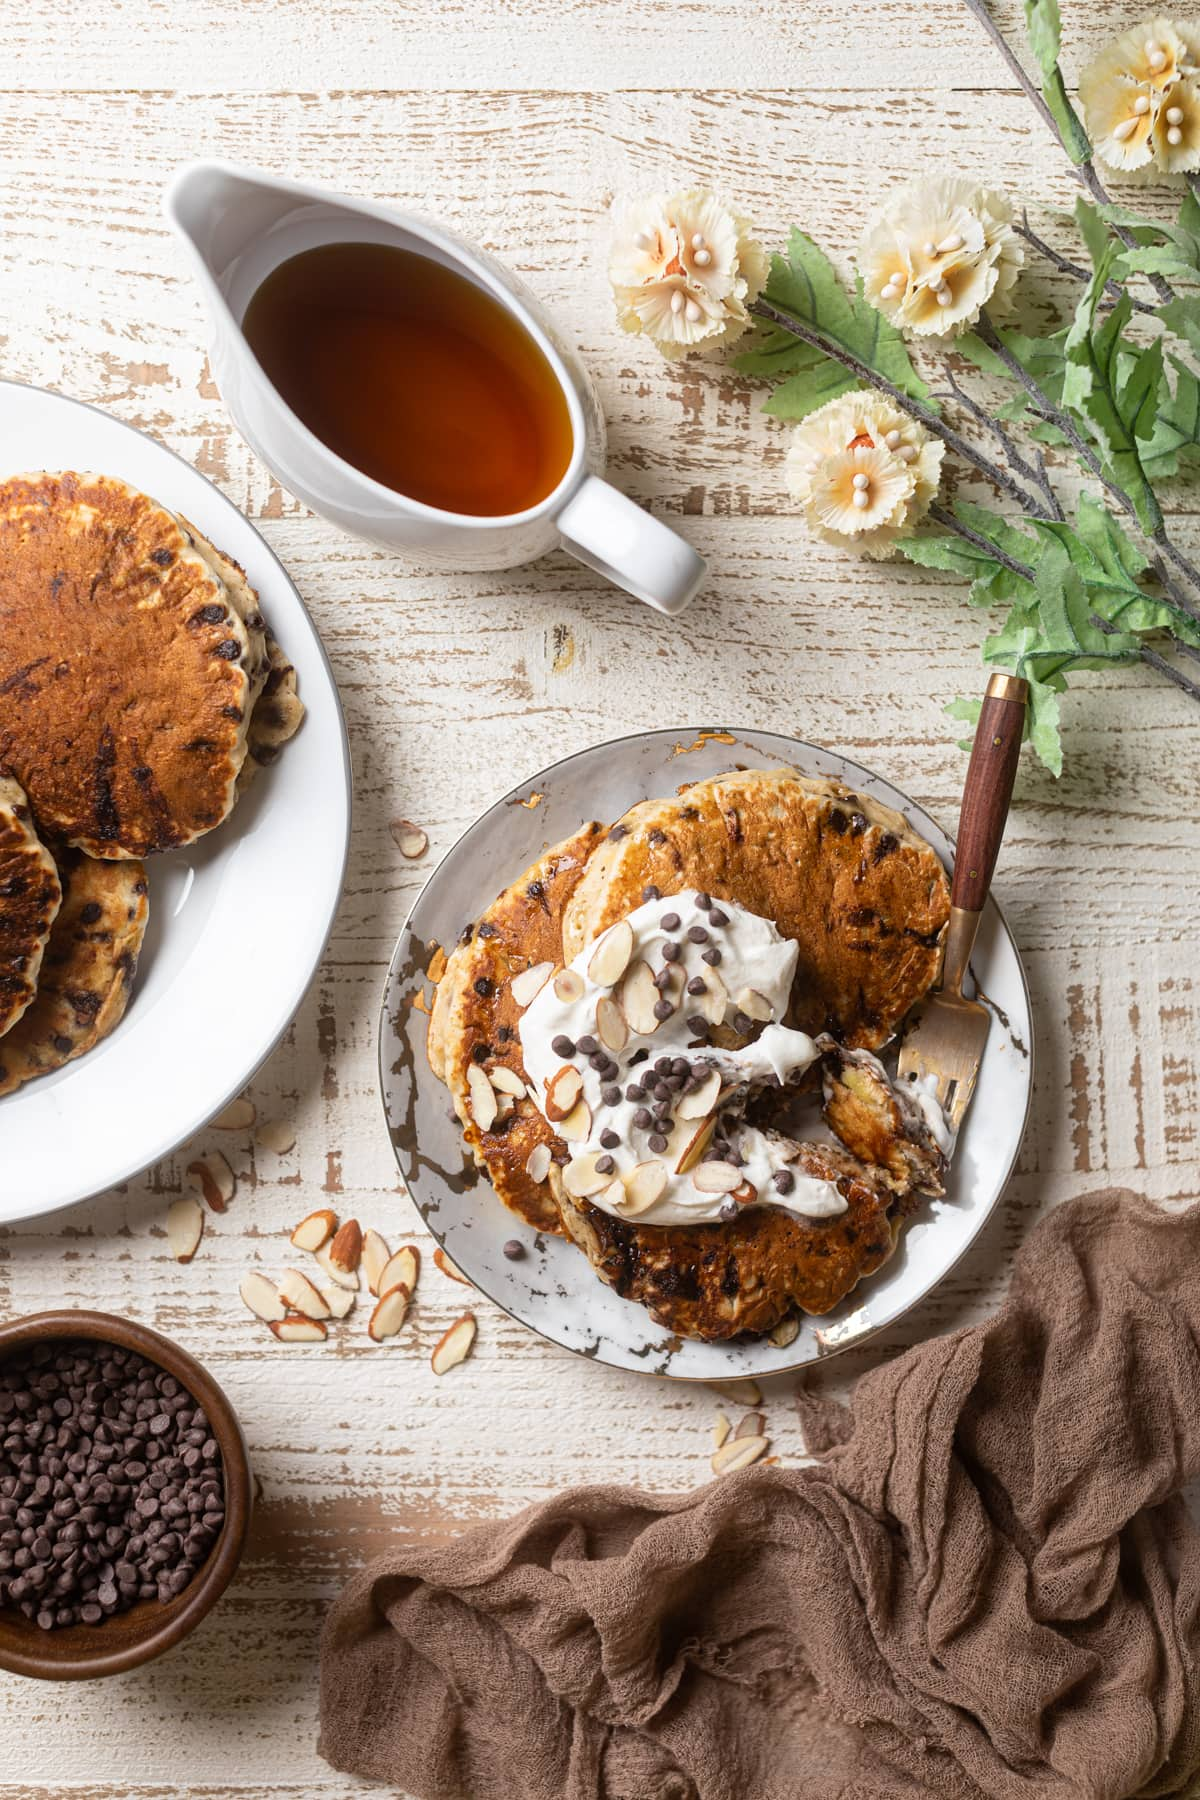 Fluffy Vegan Banana Chocolate Chip Pancakes